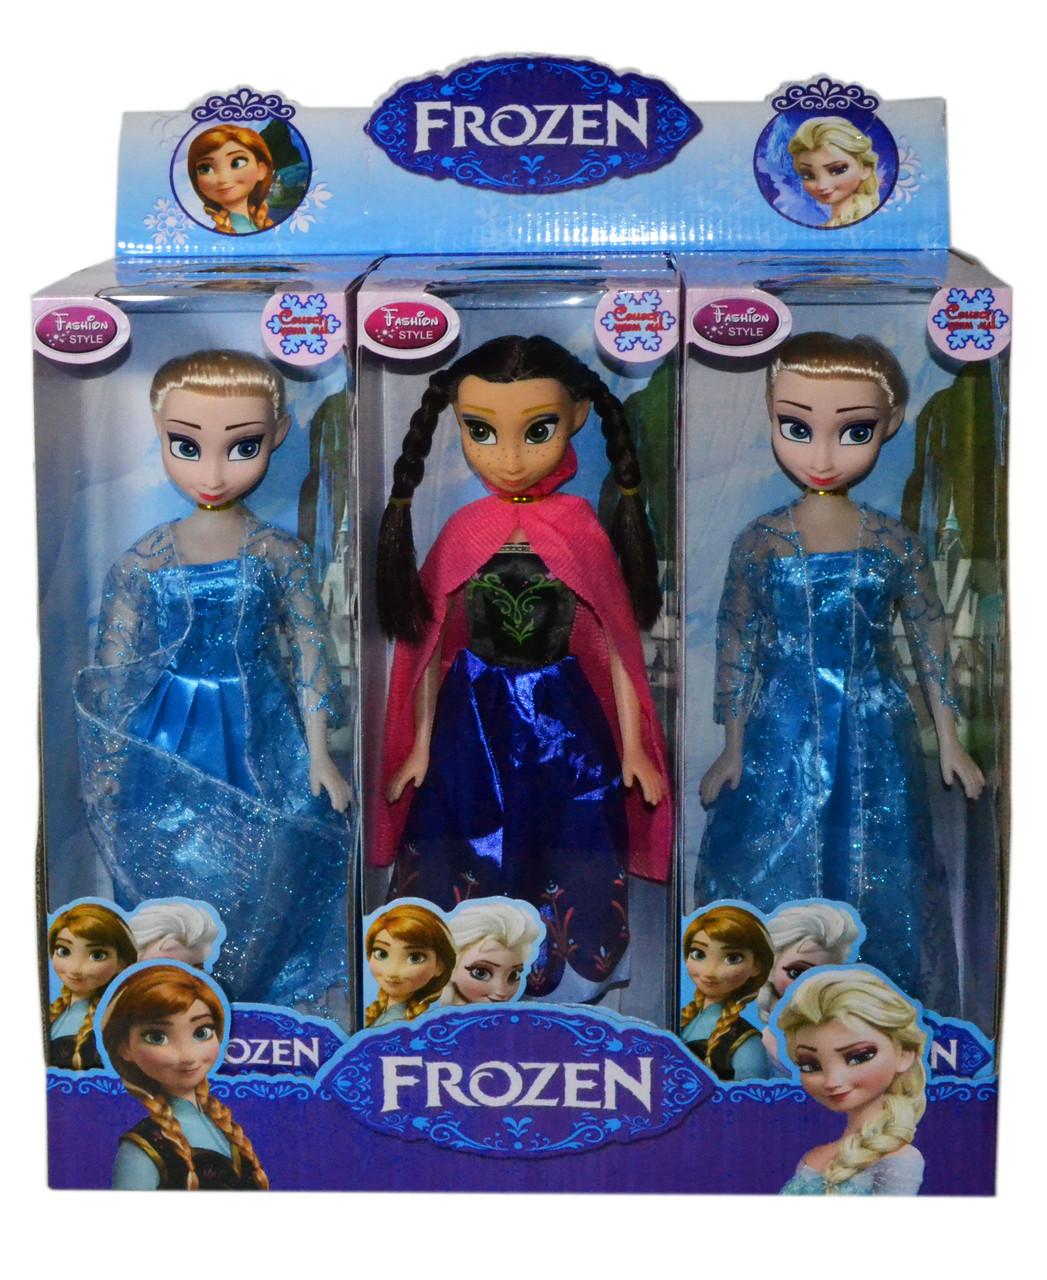 8783 Кукла 18см Холодное сердце, 6шт в уп, цена за 1шт